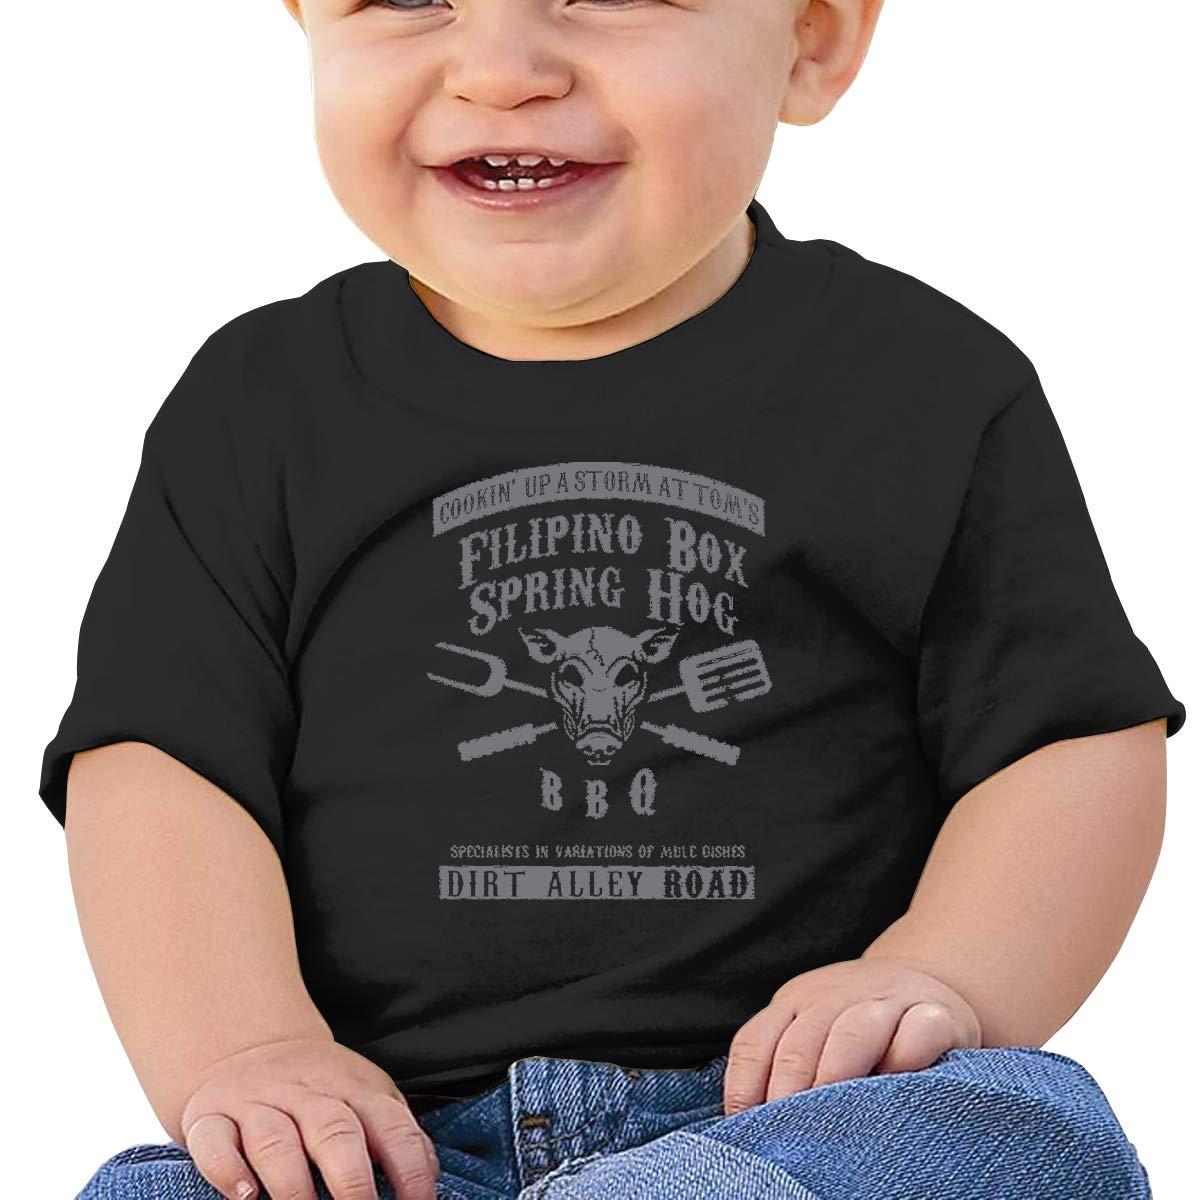 MONIKAL Unisex Infant Short Sleeve T-Shirt Tom Waits Inspired Filipino Box Spring Kids Organic Cotton Graphic Tee Tops